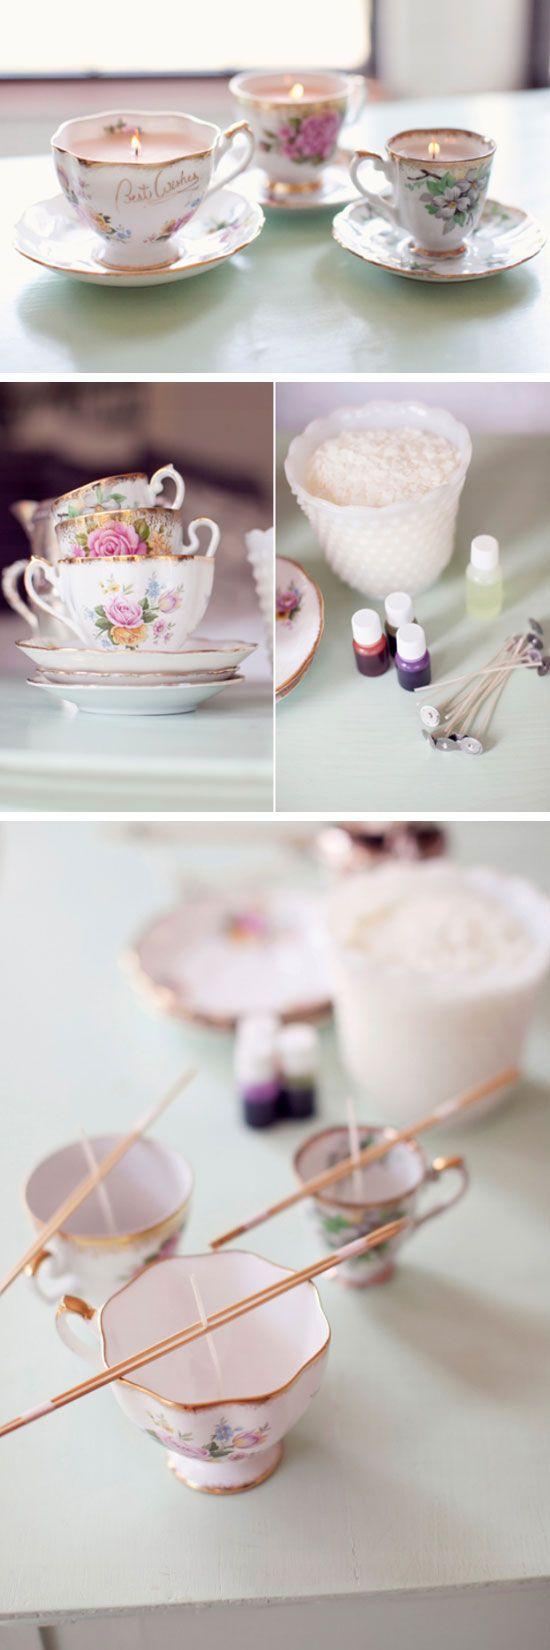 Vintage Teacup Candles | Click Pic for 22 DIY Christmas Gift Ideas for Mom | Handmade Christmas Gifts for Grandma